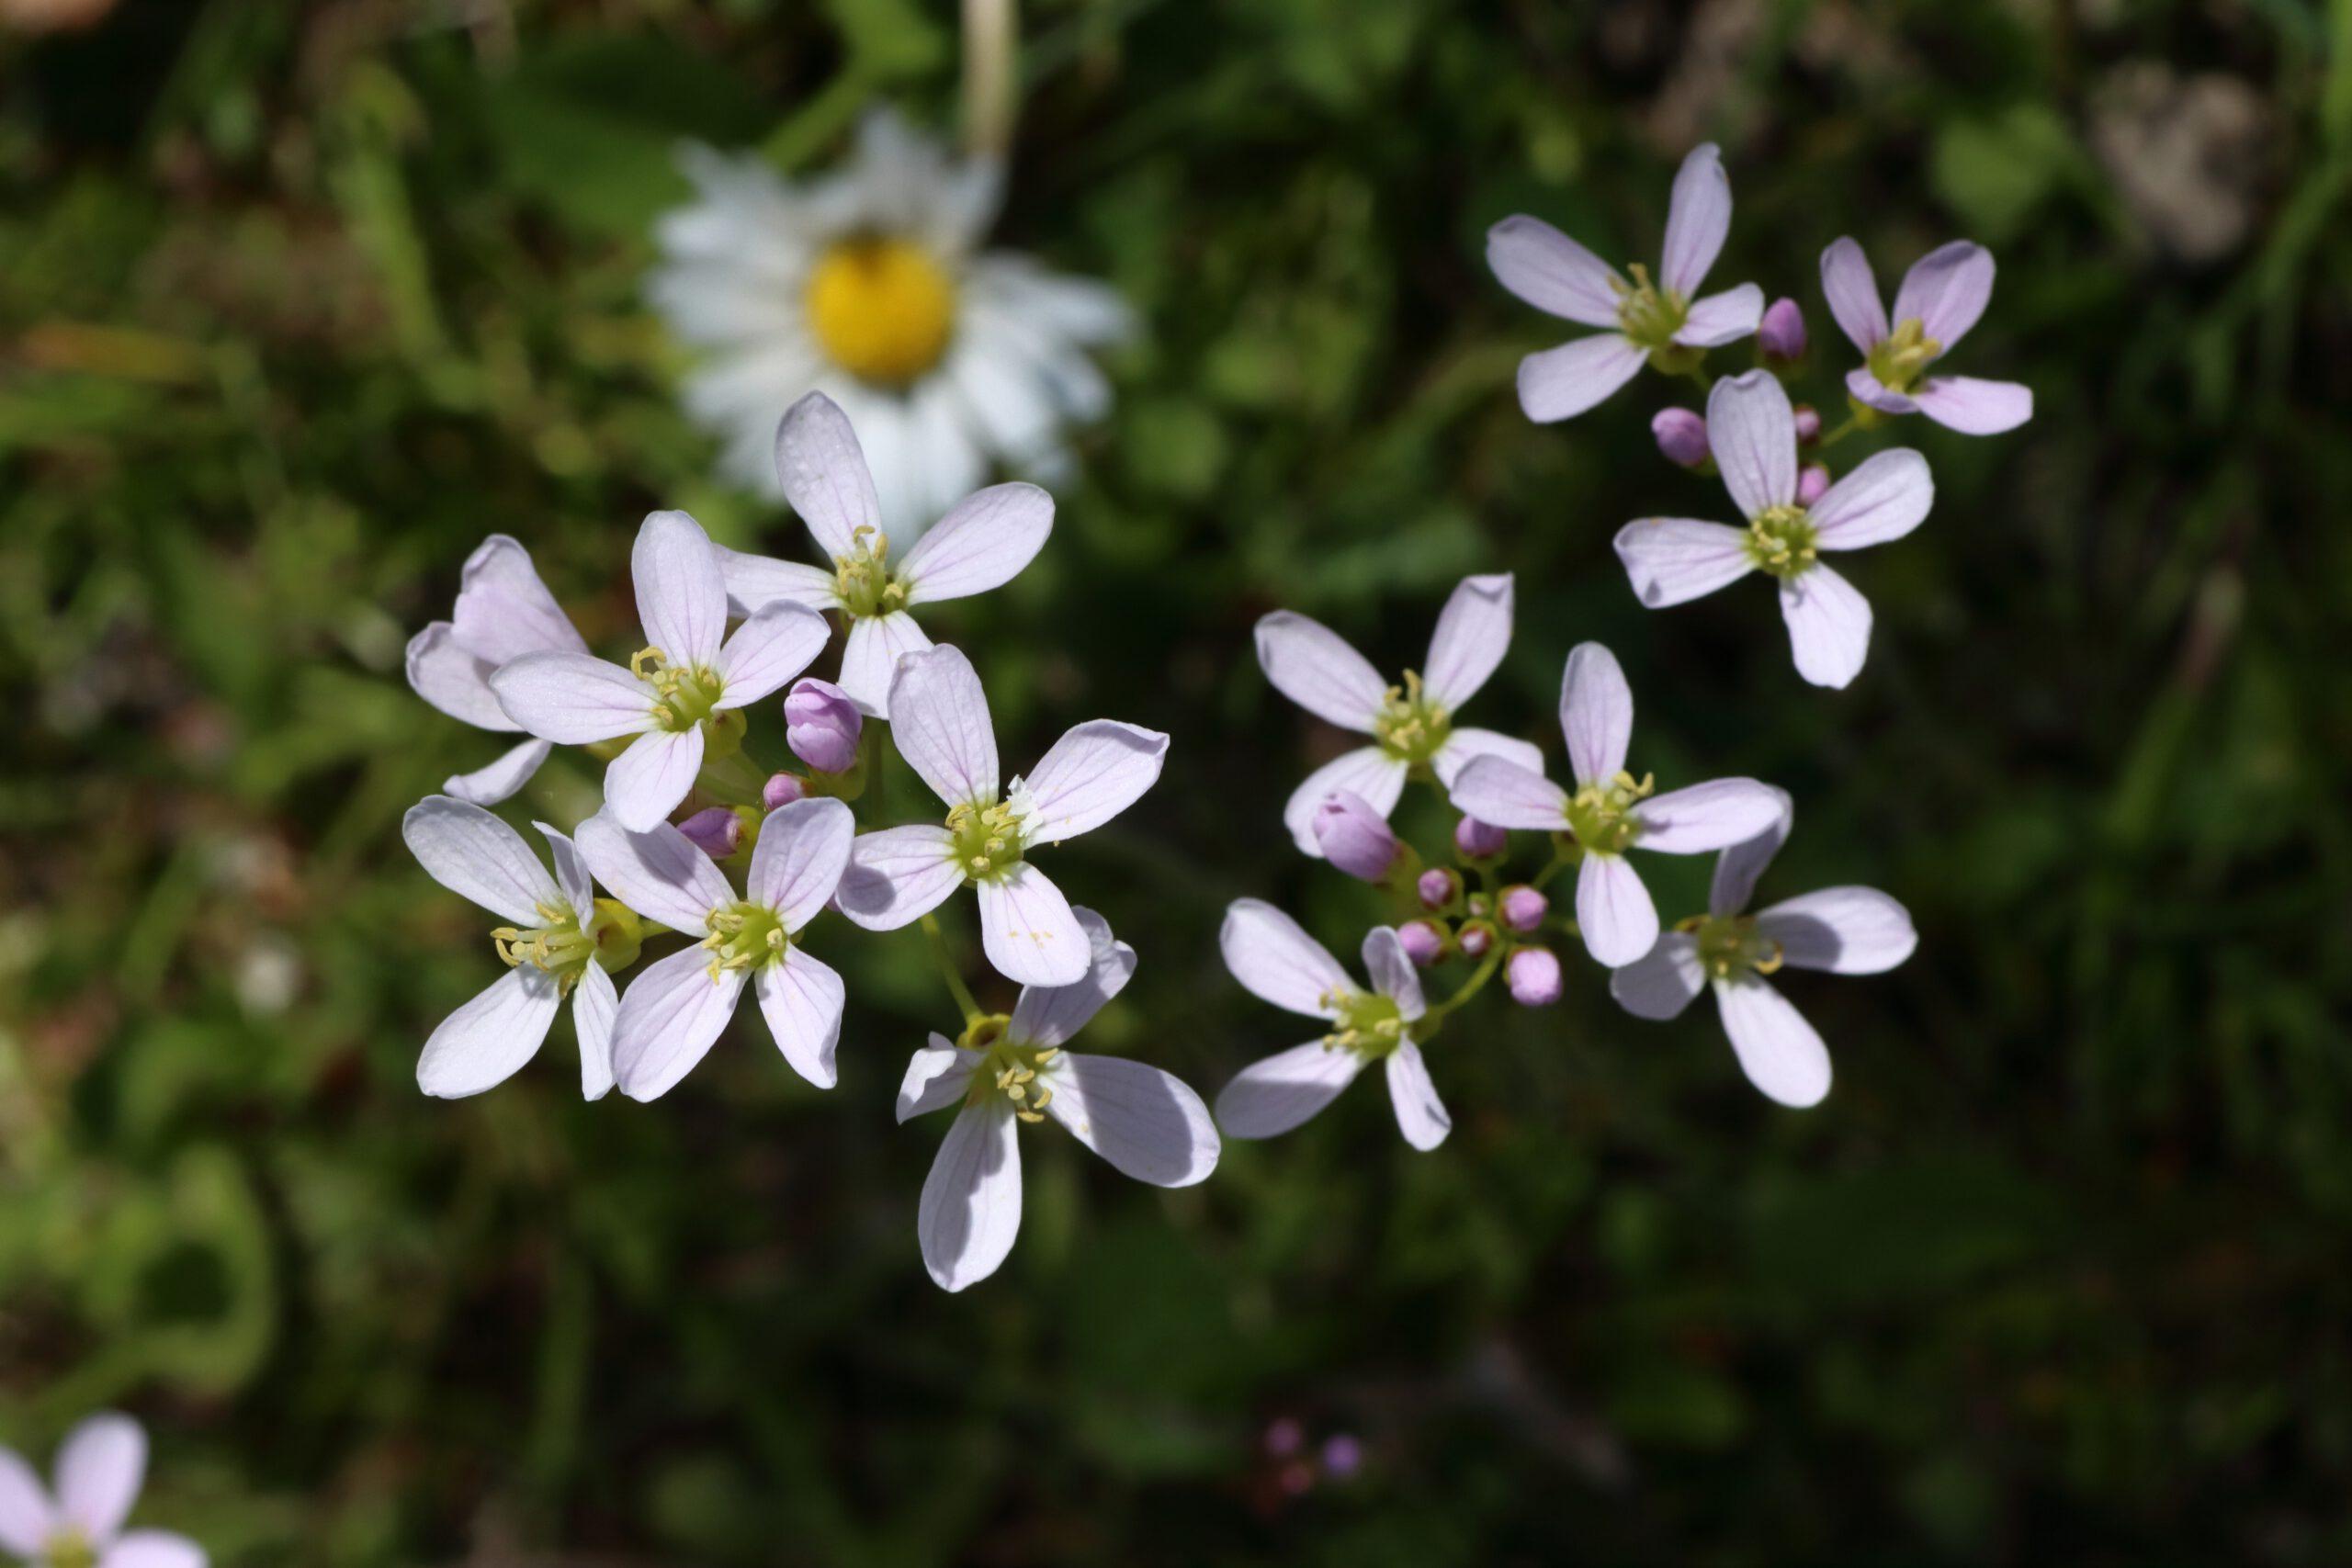 Wiesen-Schaumkraut - Blüten